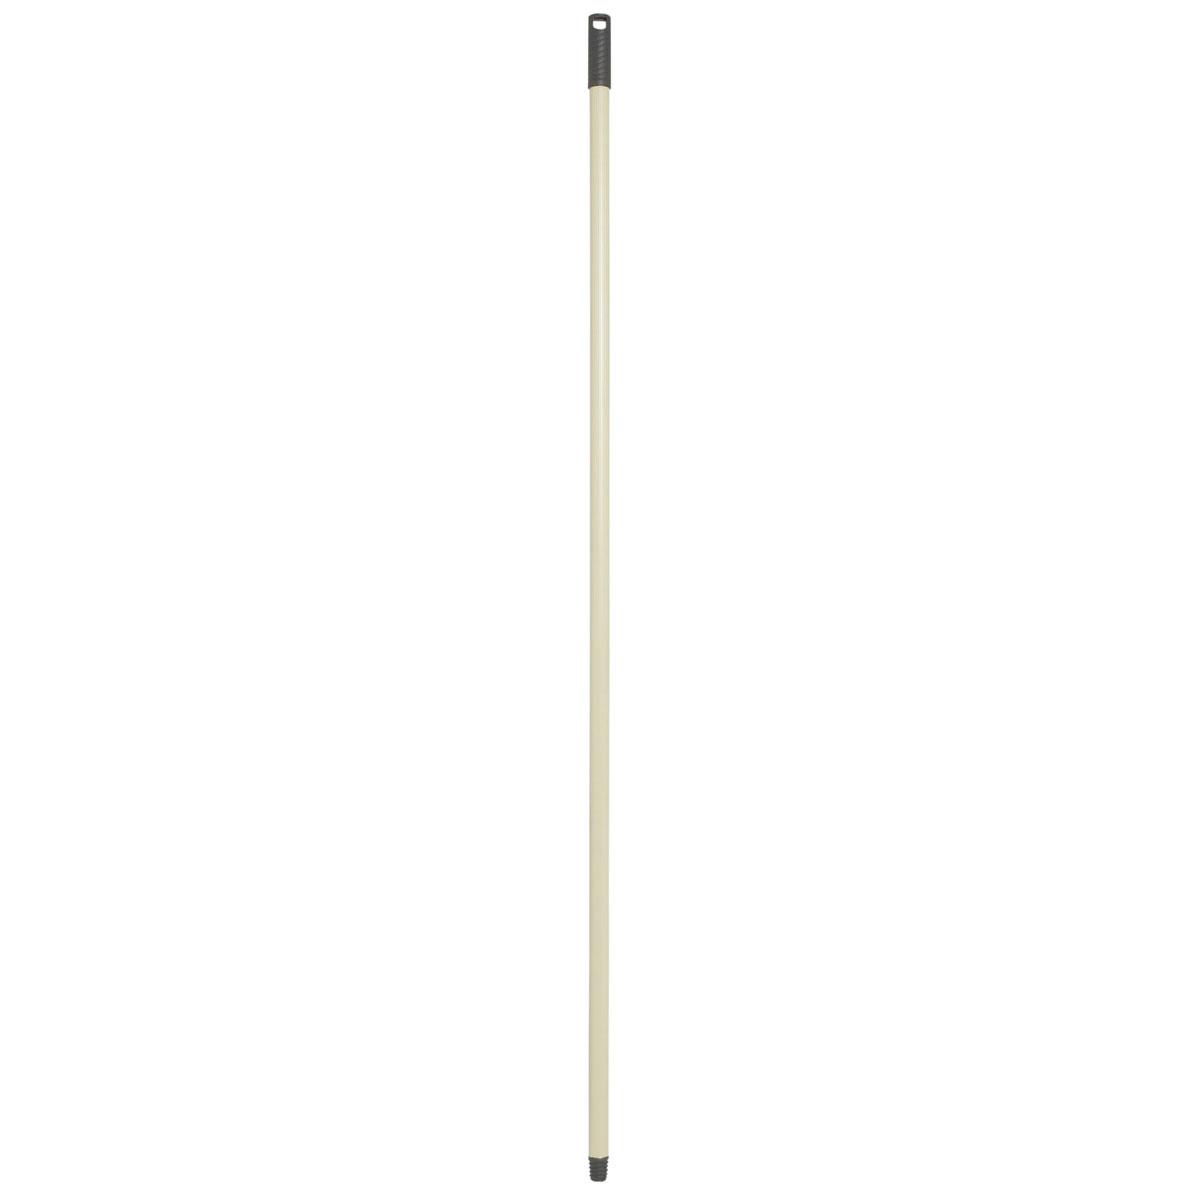 Ручка для швабры Apex Basic, 120 см. 11527-A apex 10190 a